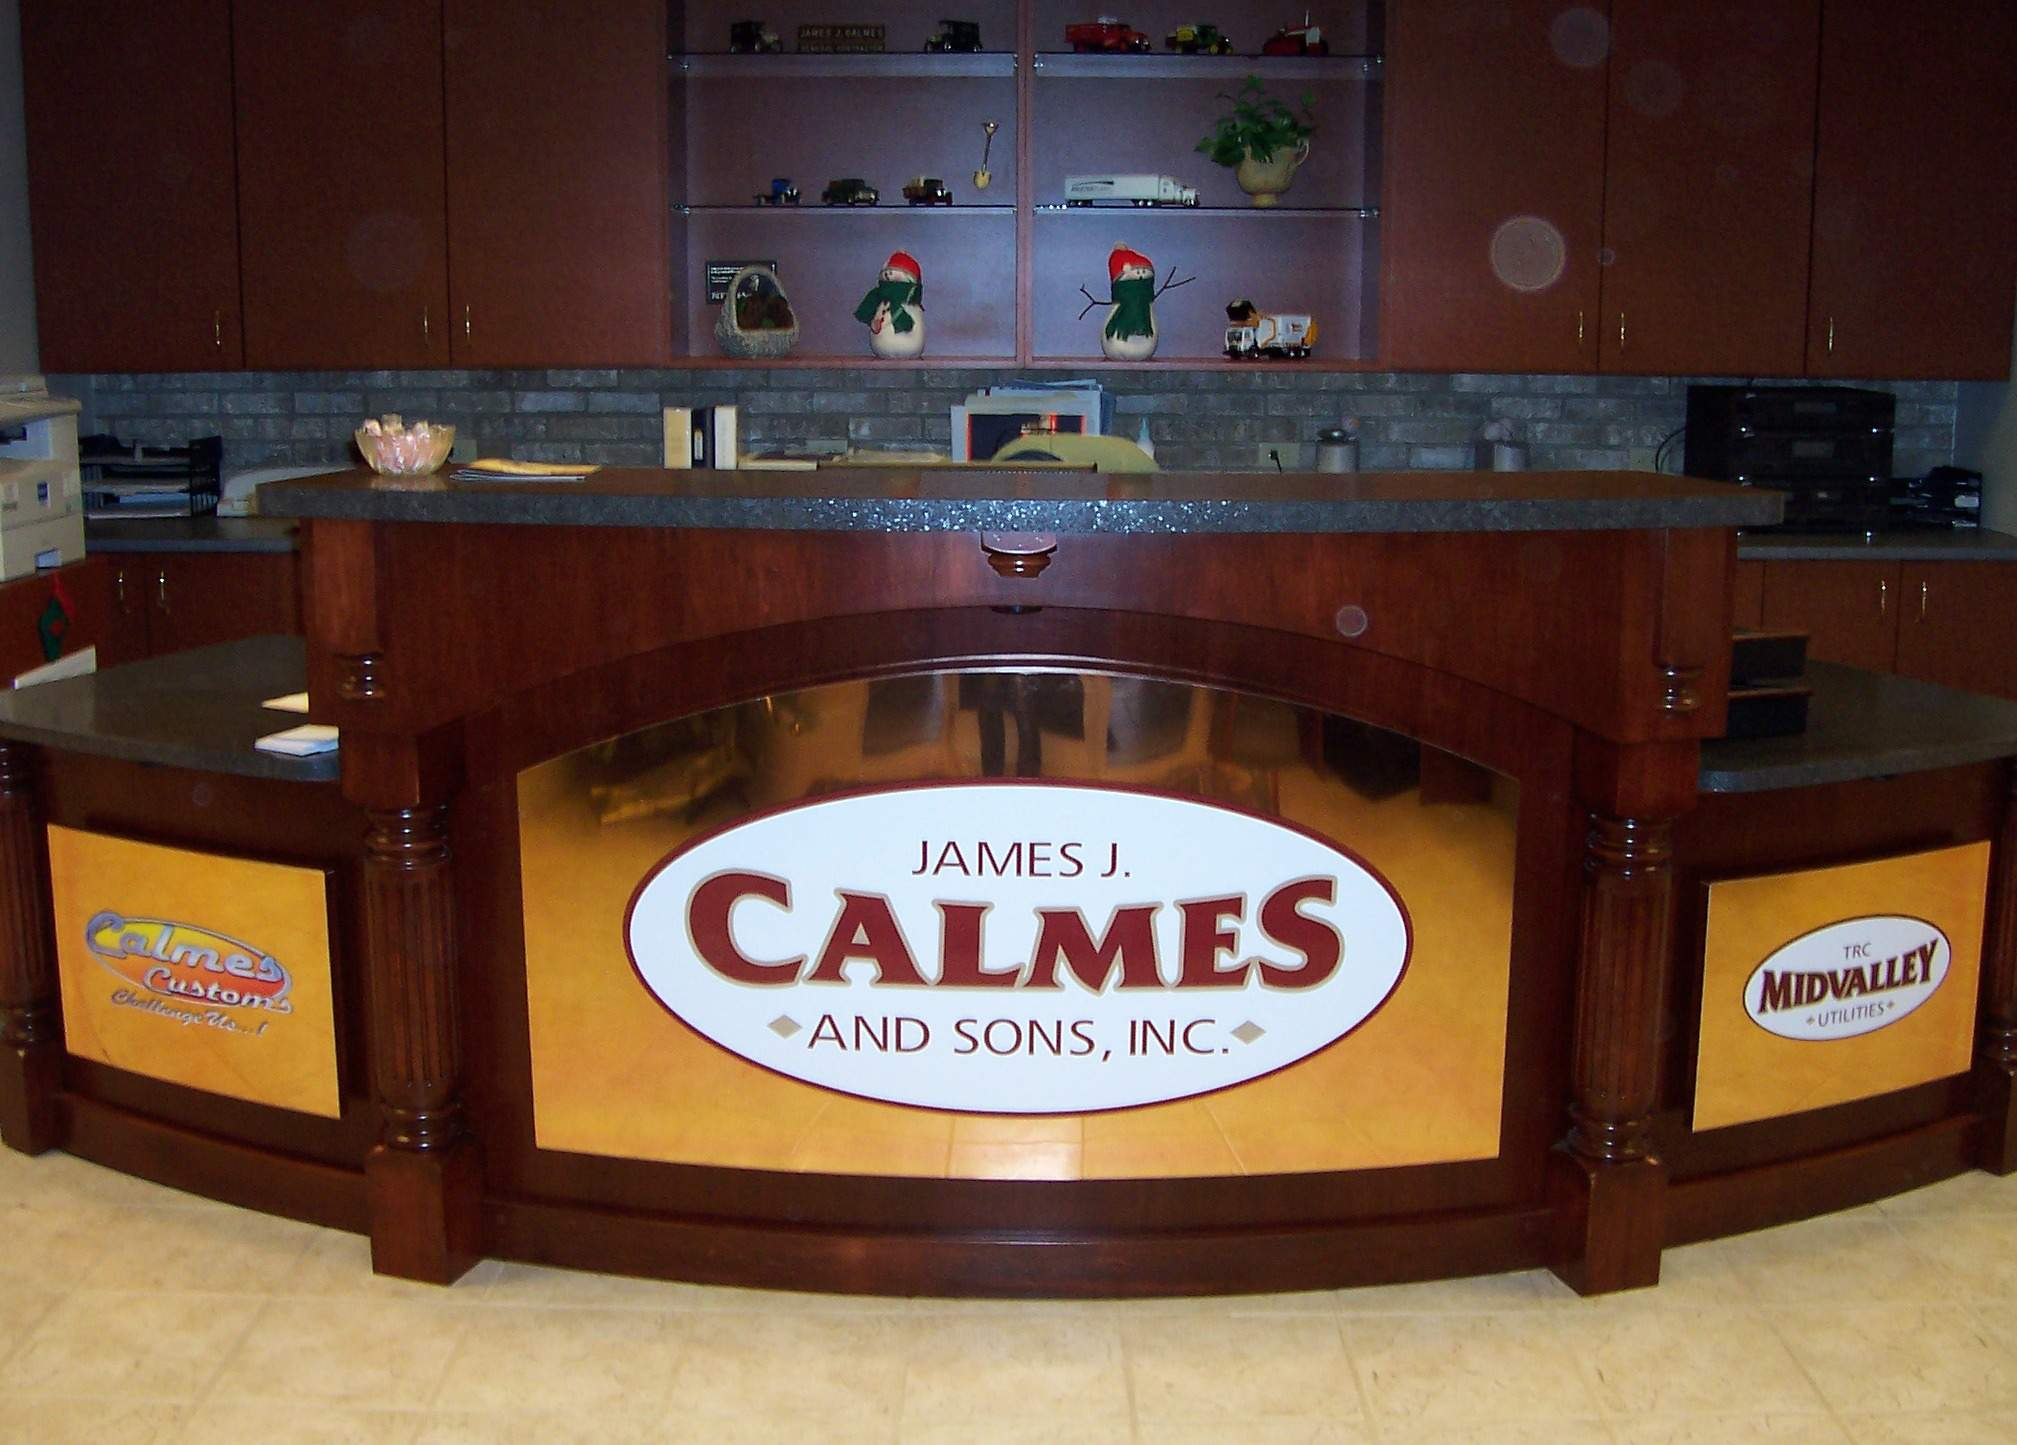 James J. Calmes and Sons, Inc.